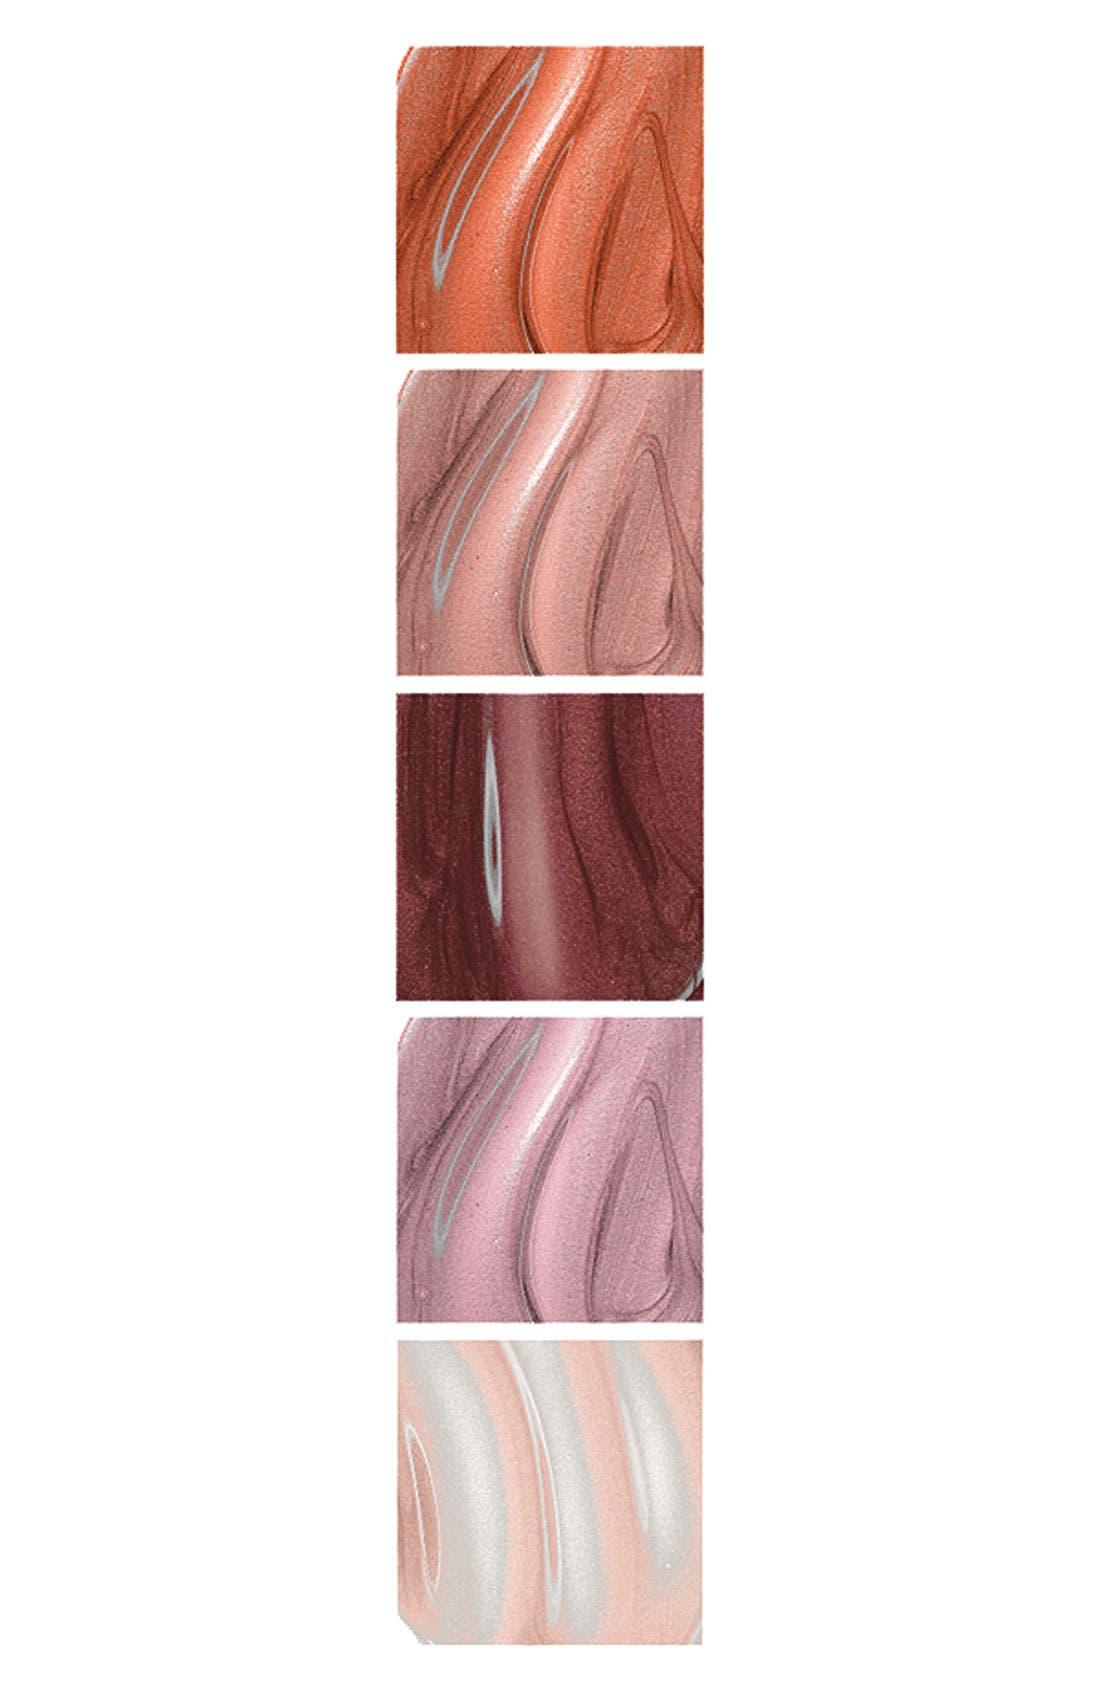 M·A·C 'A Tartan Tale - Sassy Coral Lassies' Lipglass Set,                             Alternate thumbnail 2, color,                             800